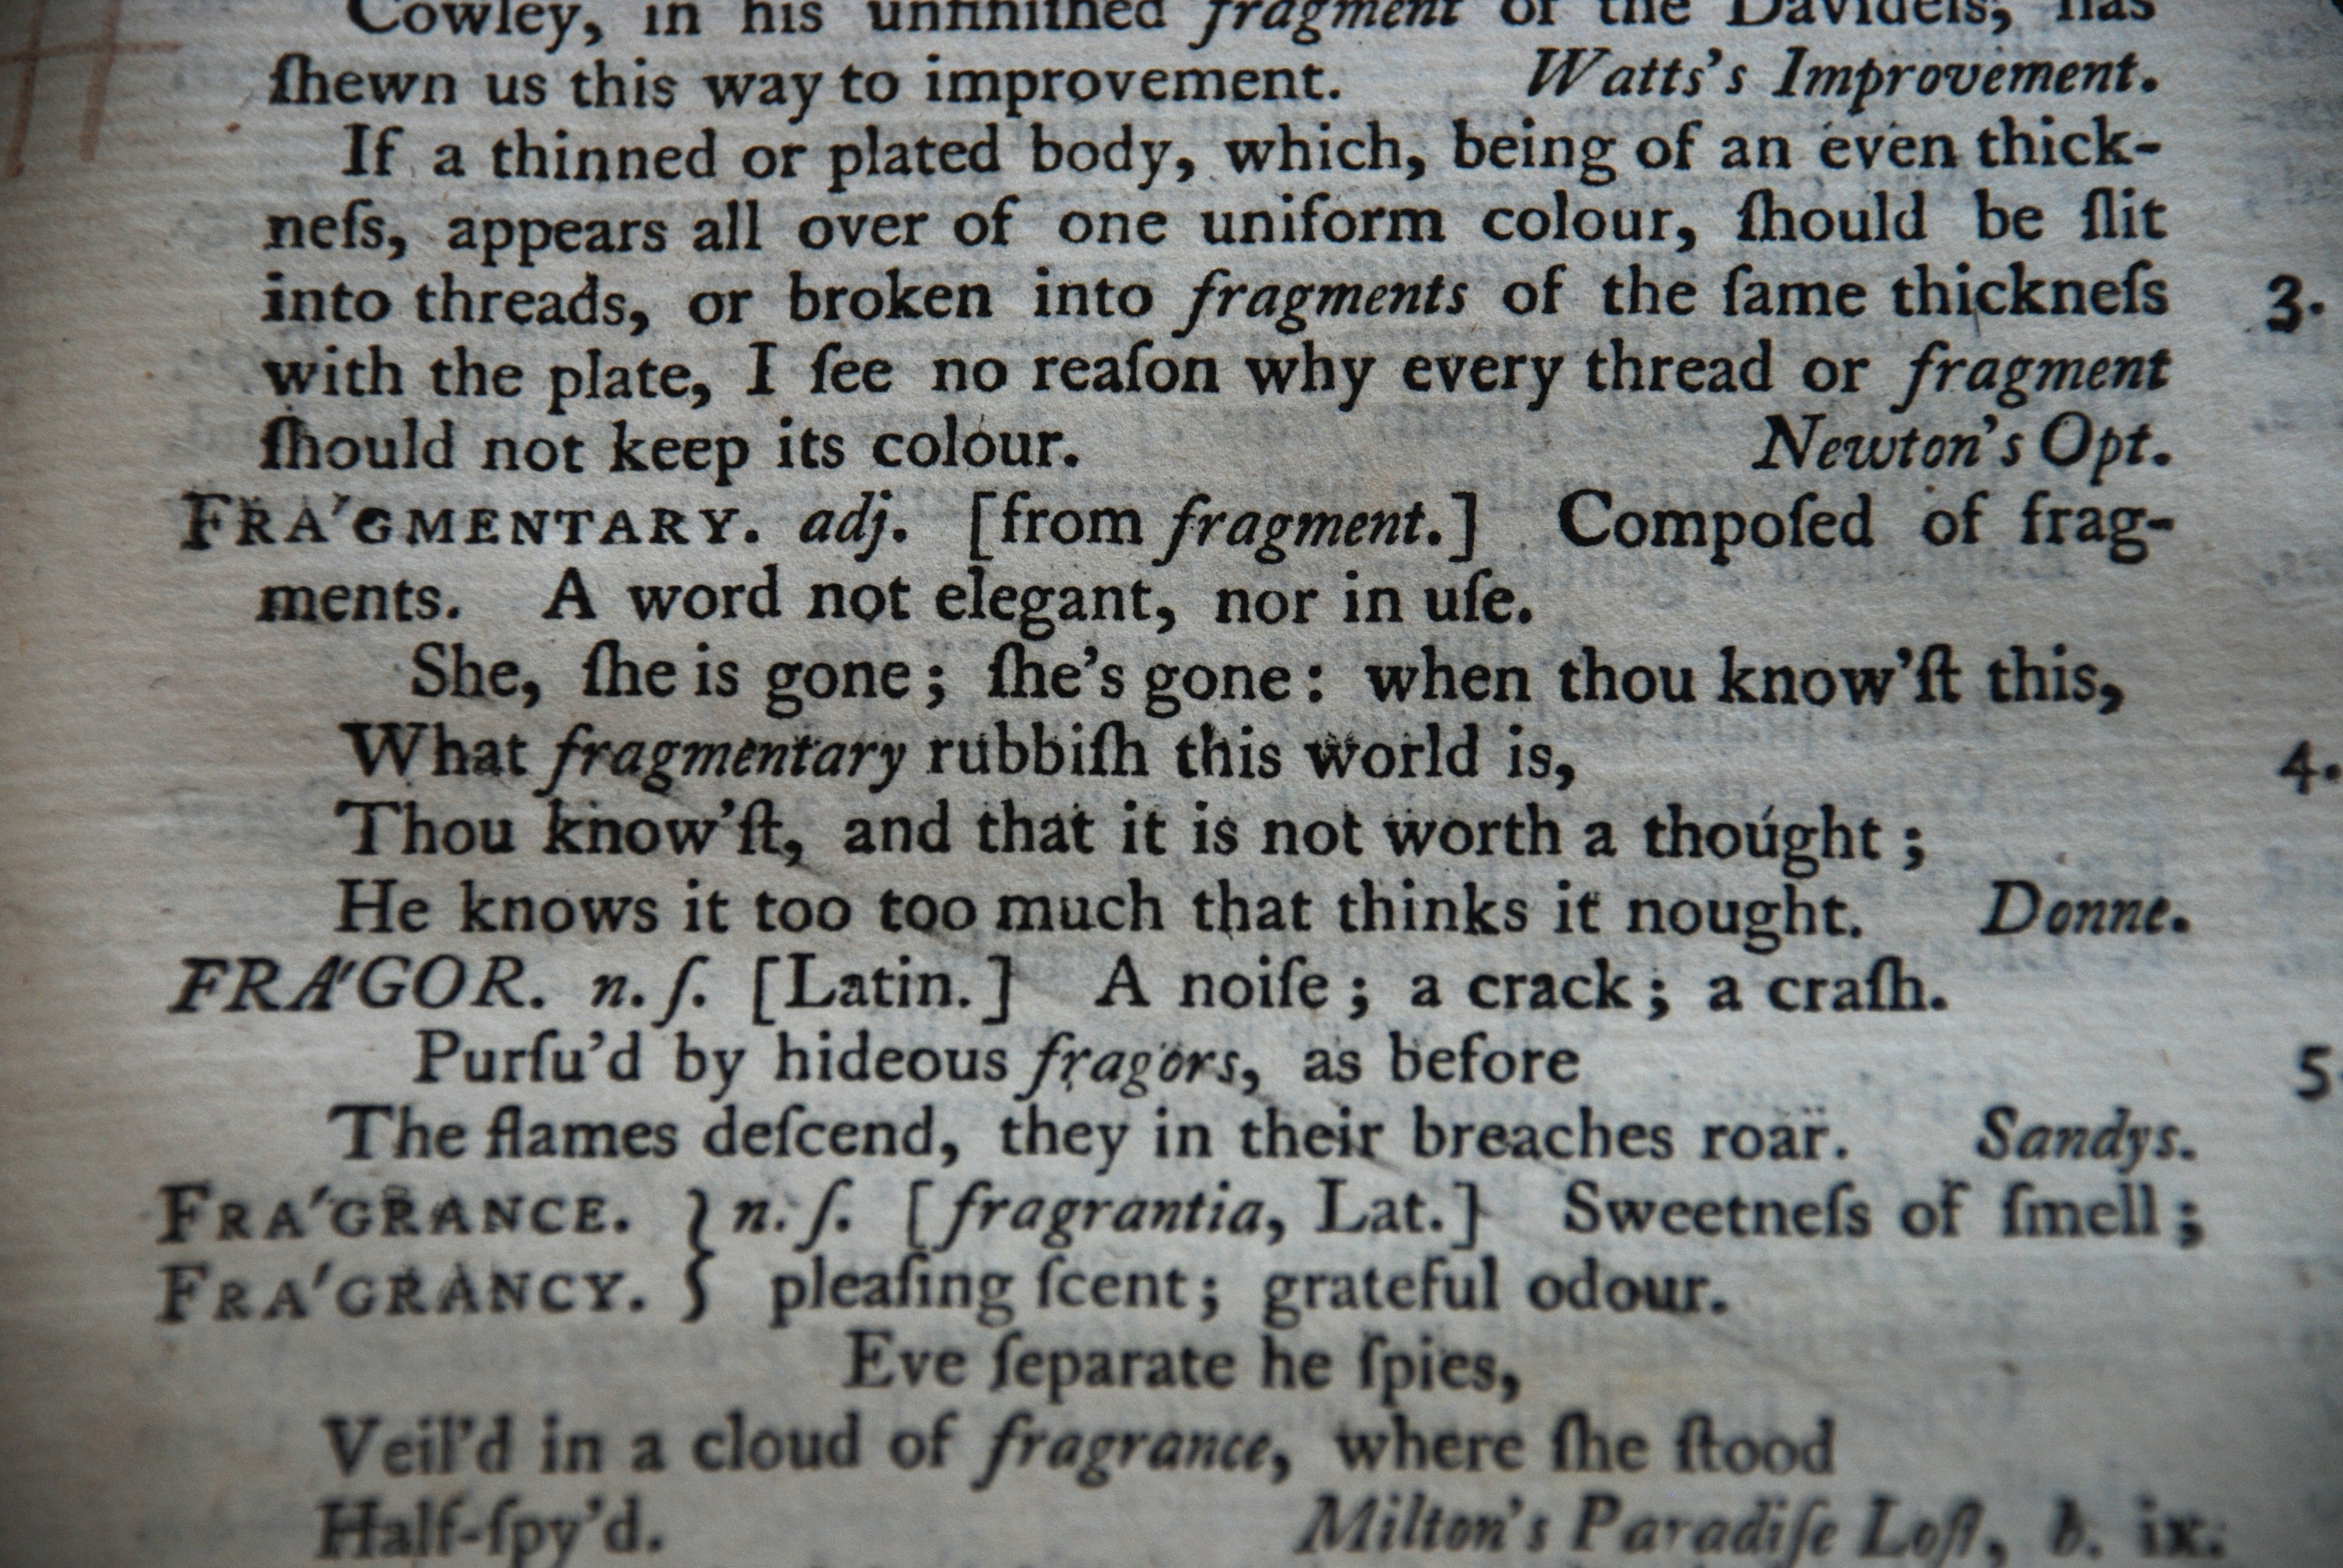 fragmentary-adj